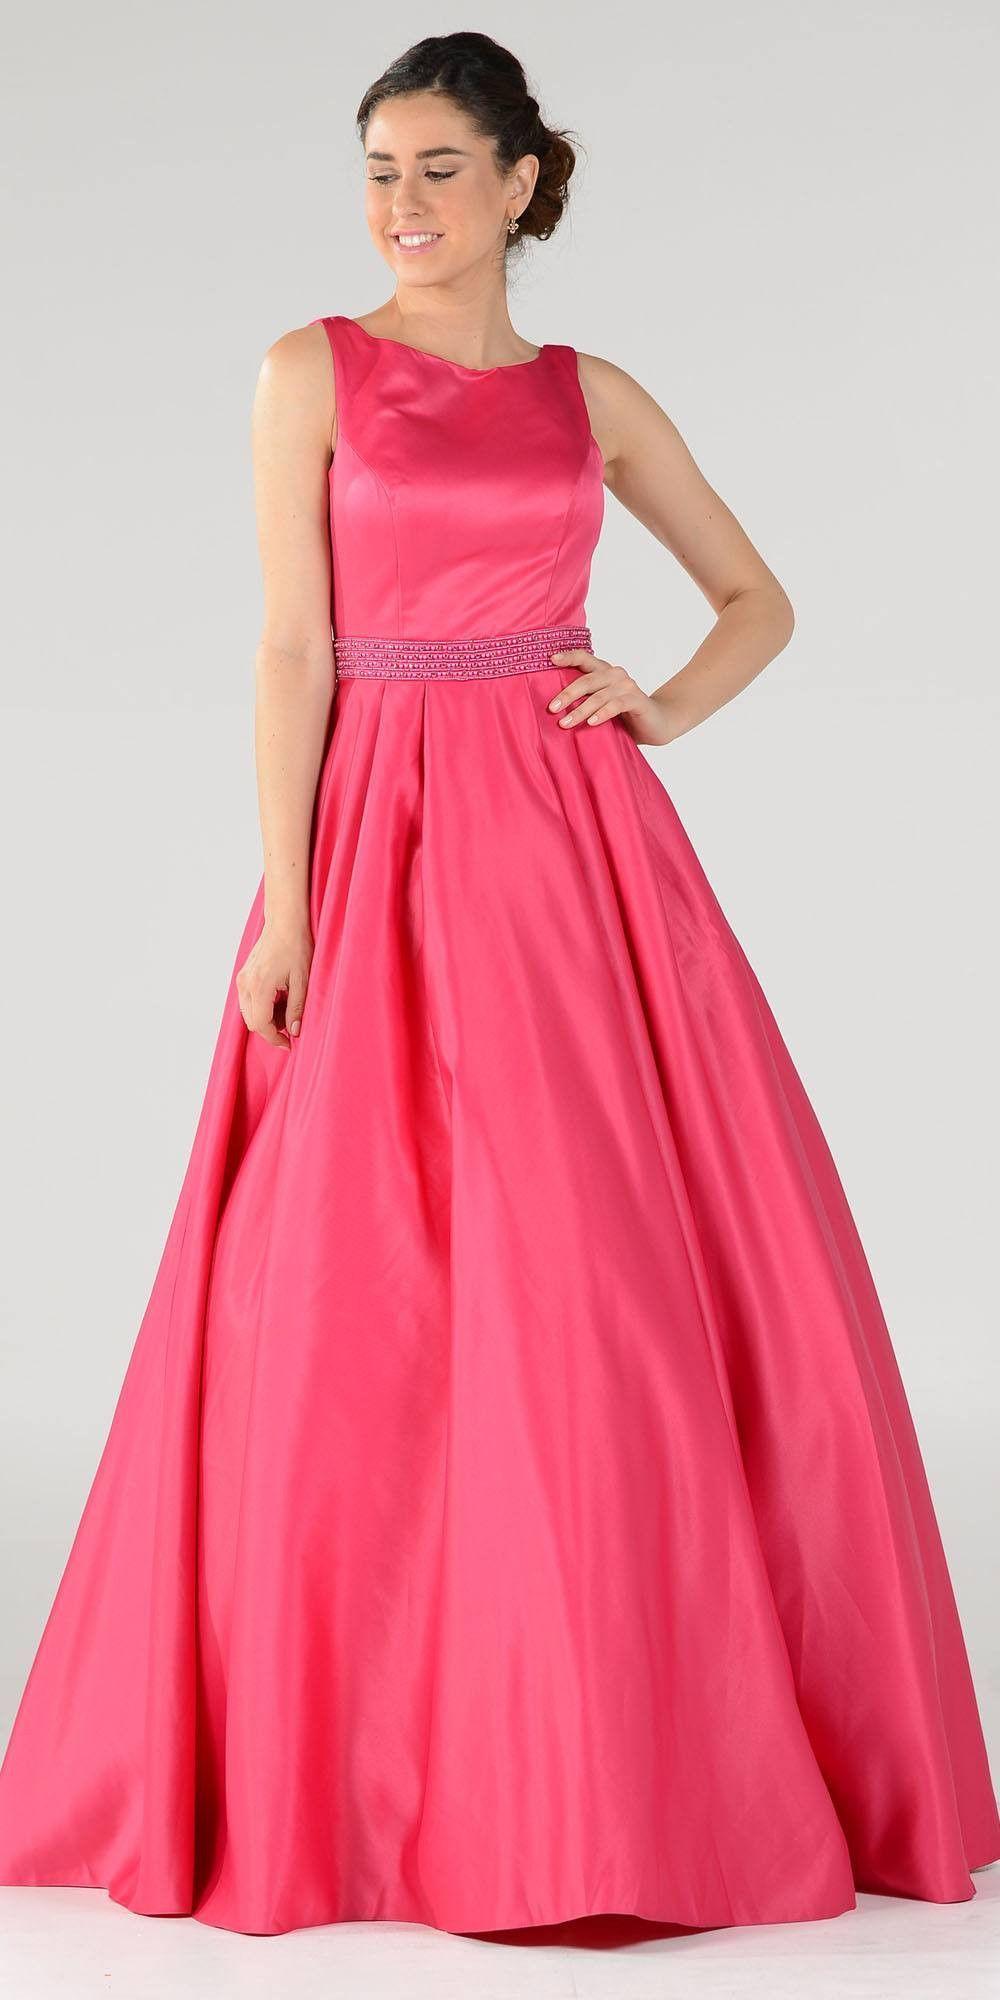 Bateau neck satin aline ball gown embellished waist fuchsia